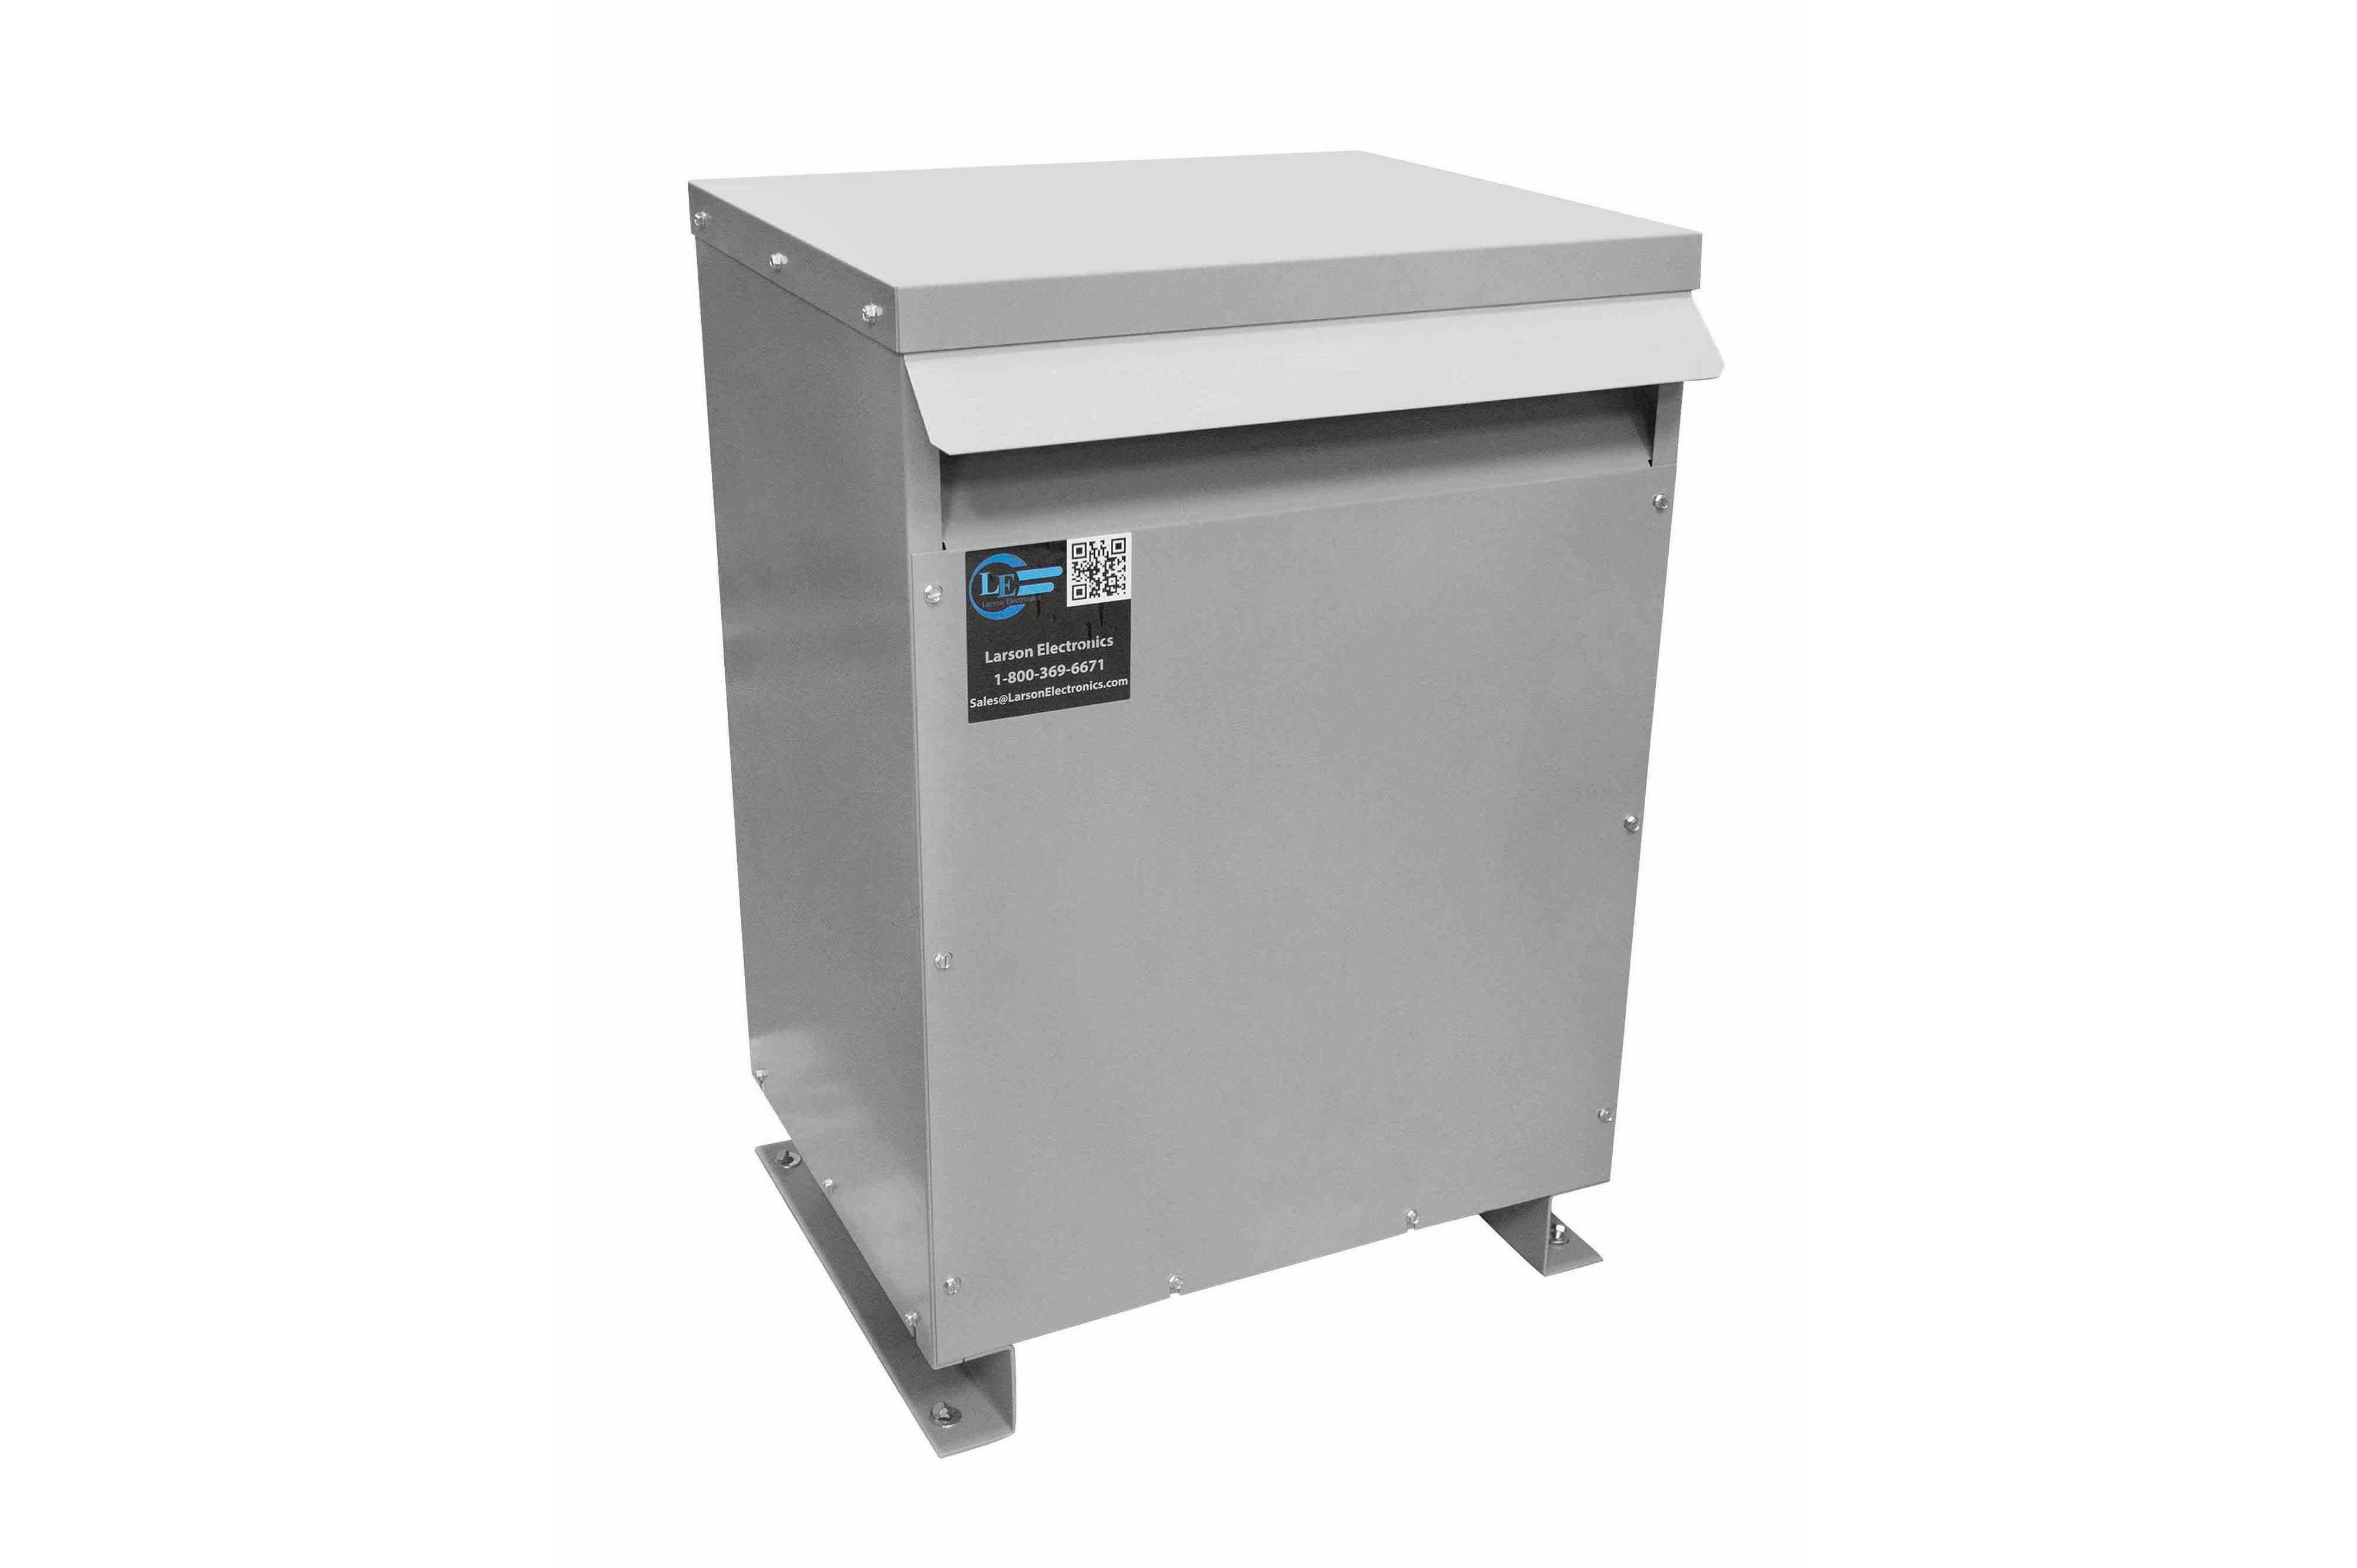 167 kVA 3PH Isolation Transformer, 380V Wye Primary, 600Y/347 Wye-N Secondary, N3R, Ventilated, 60 Hz